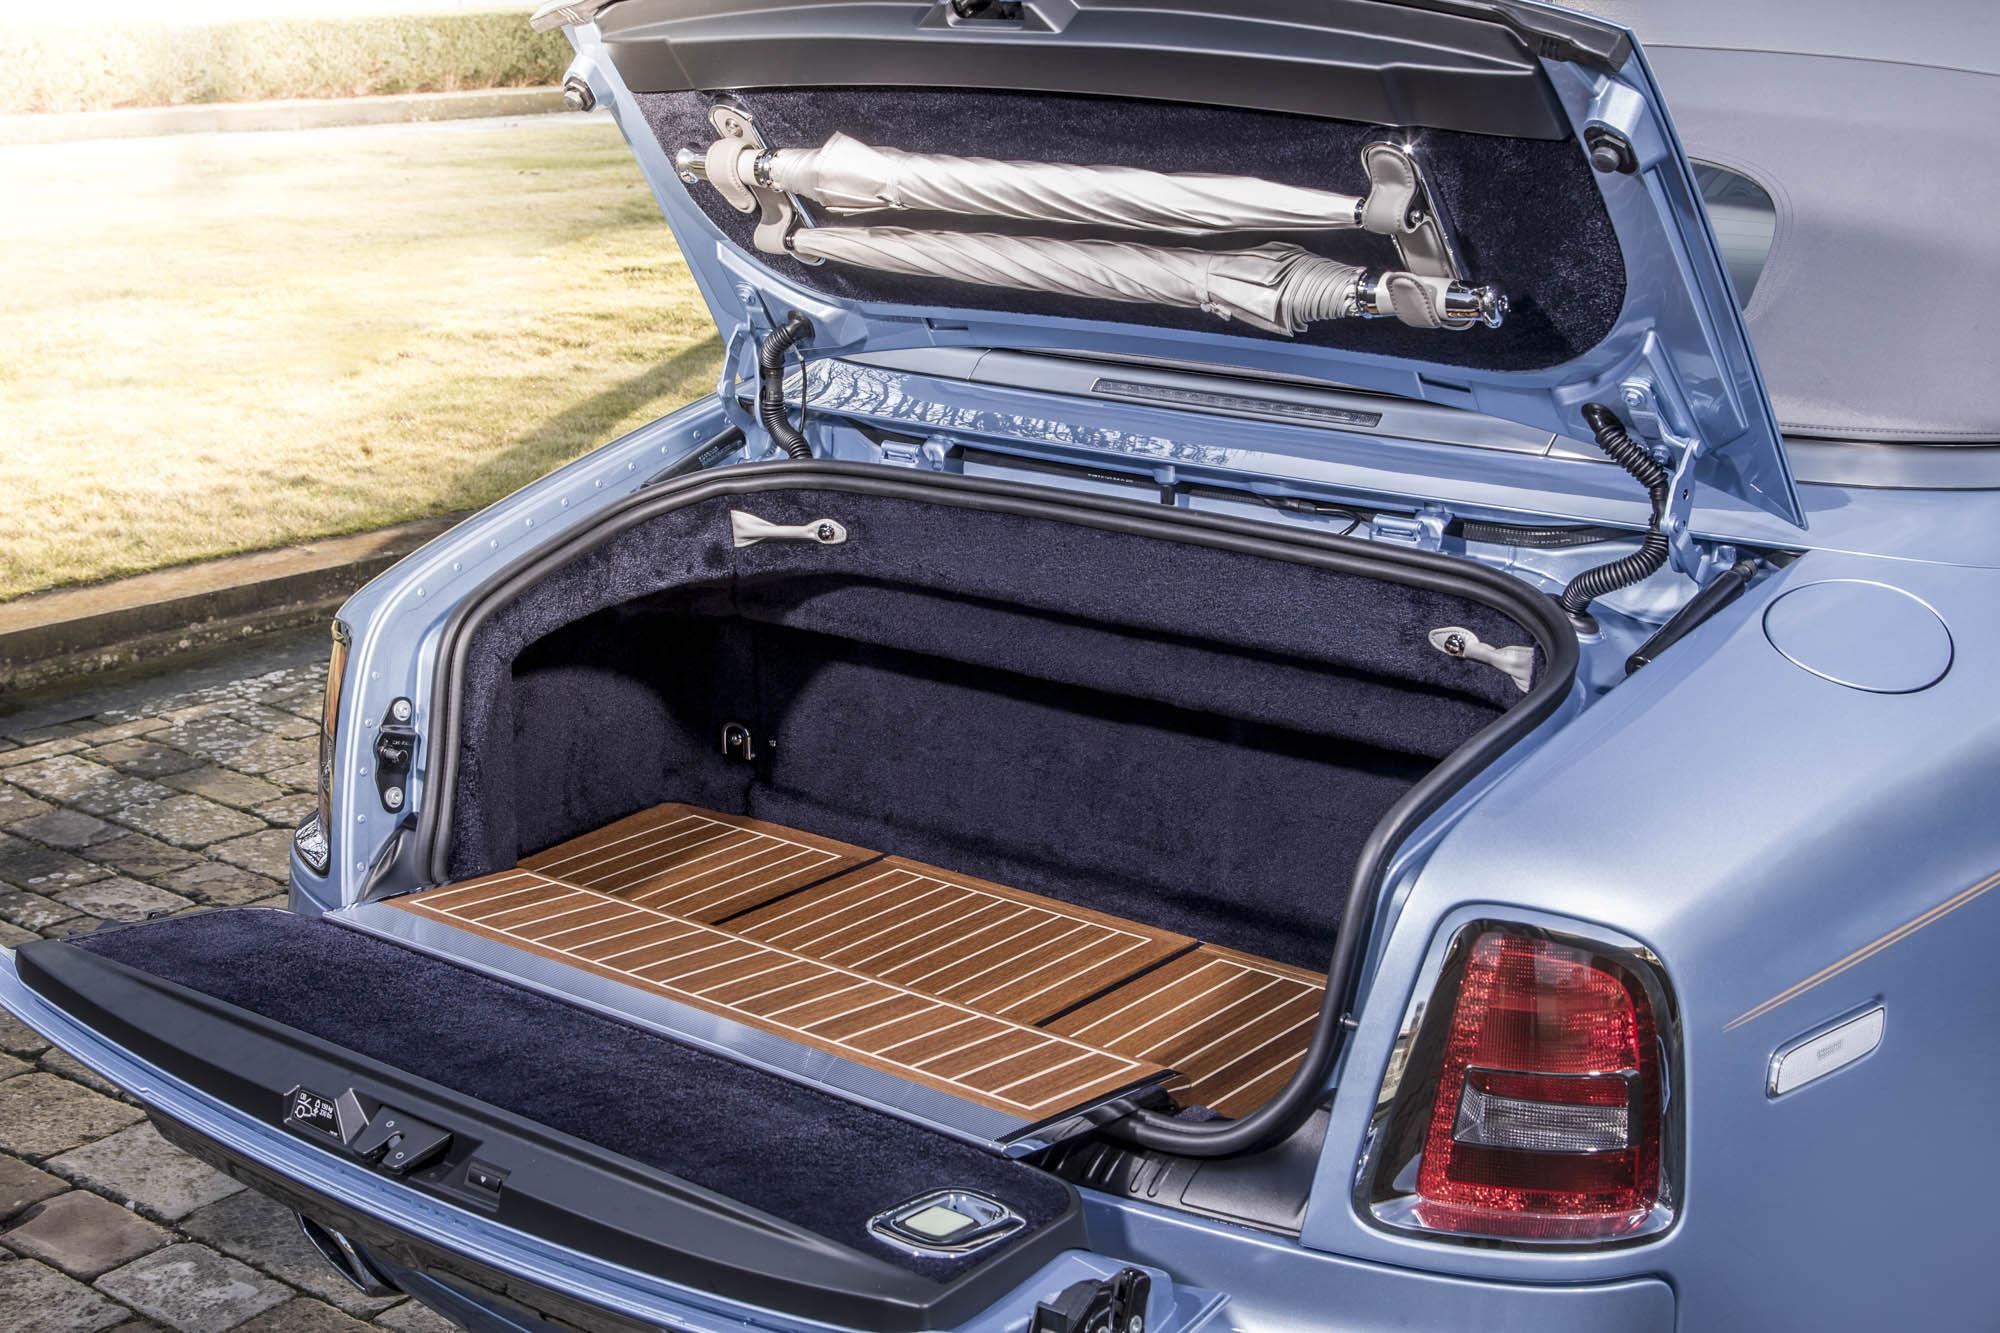 The Rolls-Royce 'Blue Magpie' Phantom Drophead Coupé